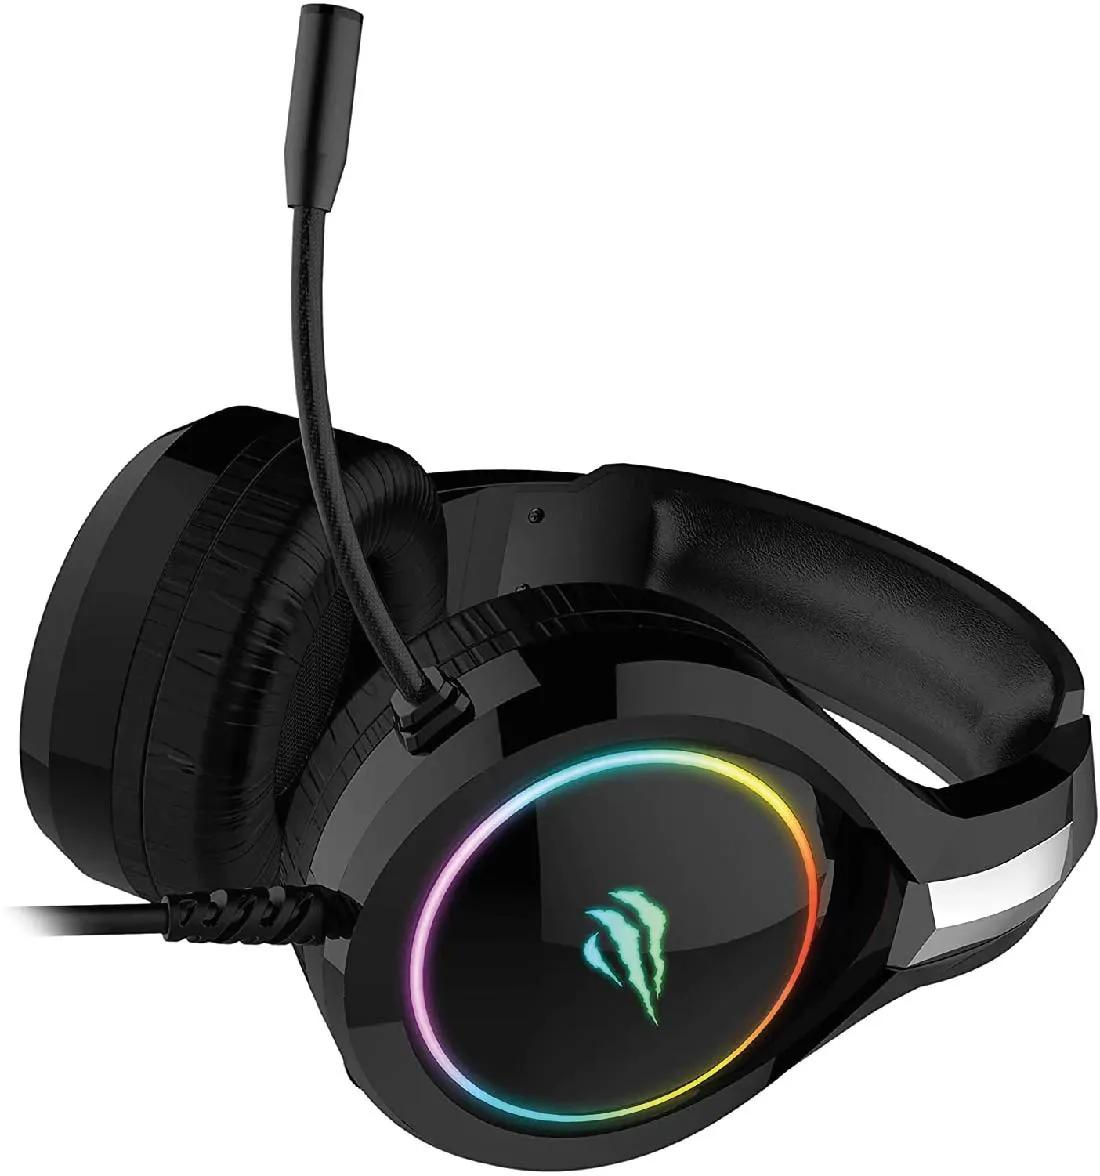 Headset Fone De Ouvido Headset Gamer Havit Hv-h2232d RGB